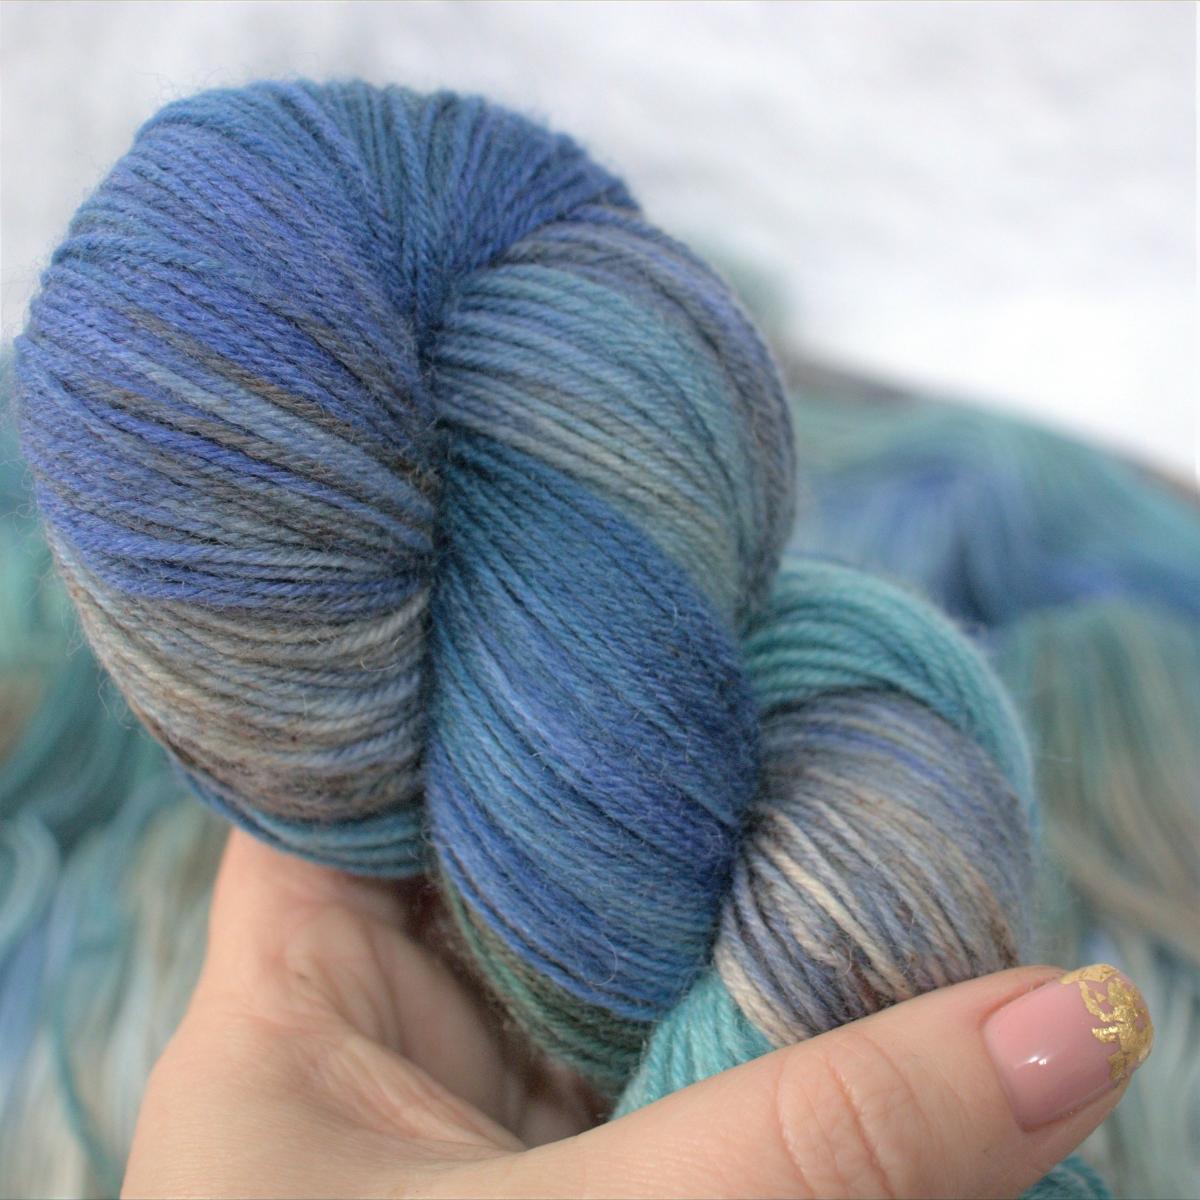 woodico.pro hand dyed yarn 051 copy 3 1200x1200 - Hand dyed yarn / 052